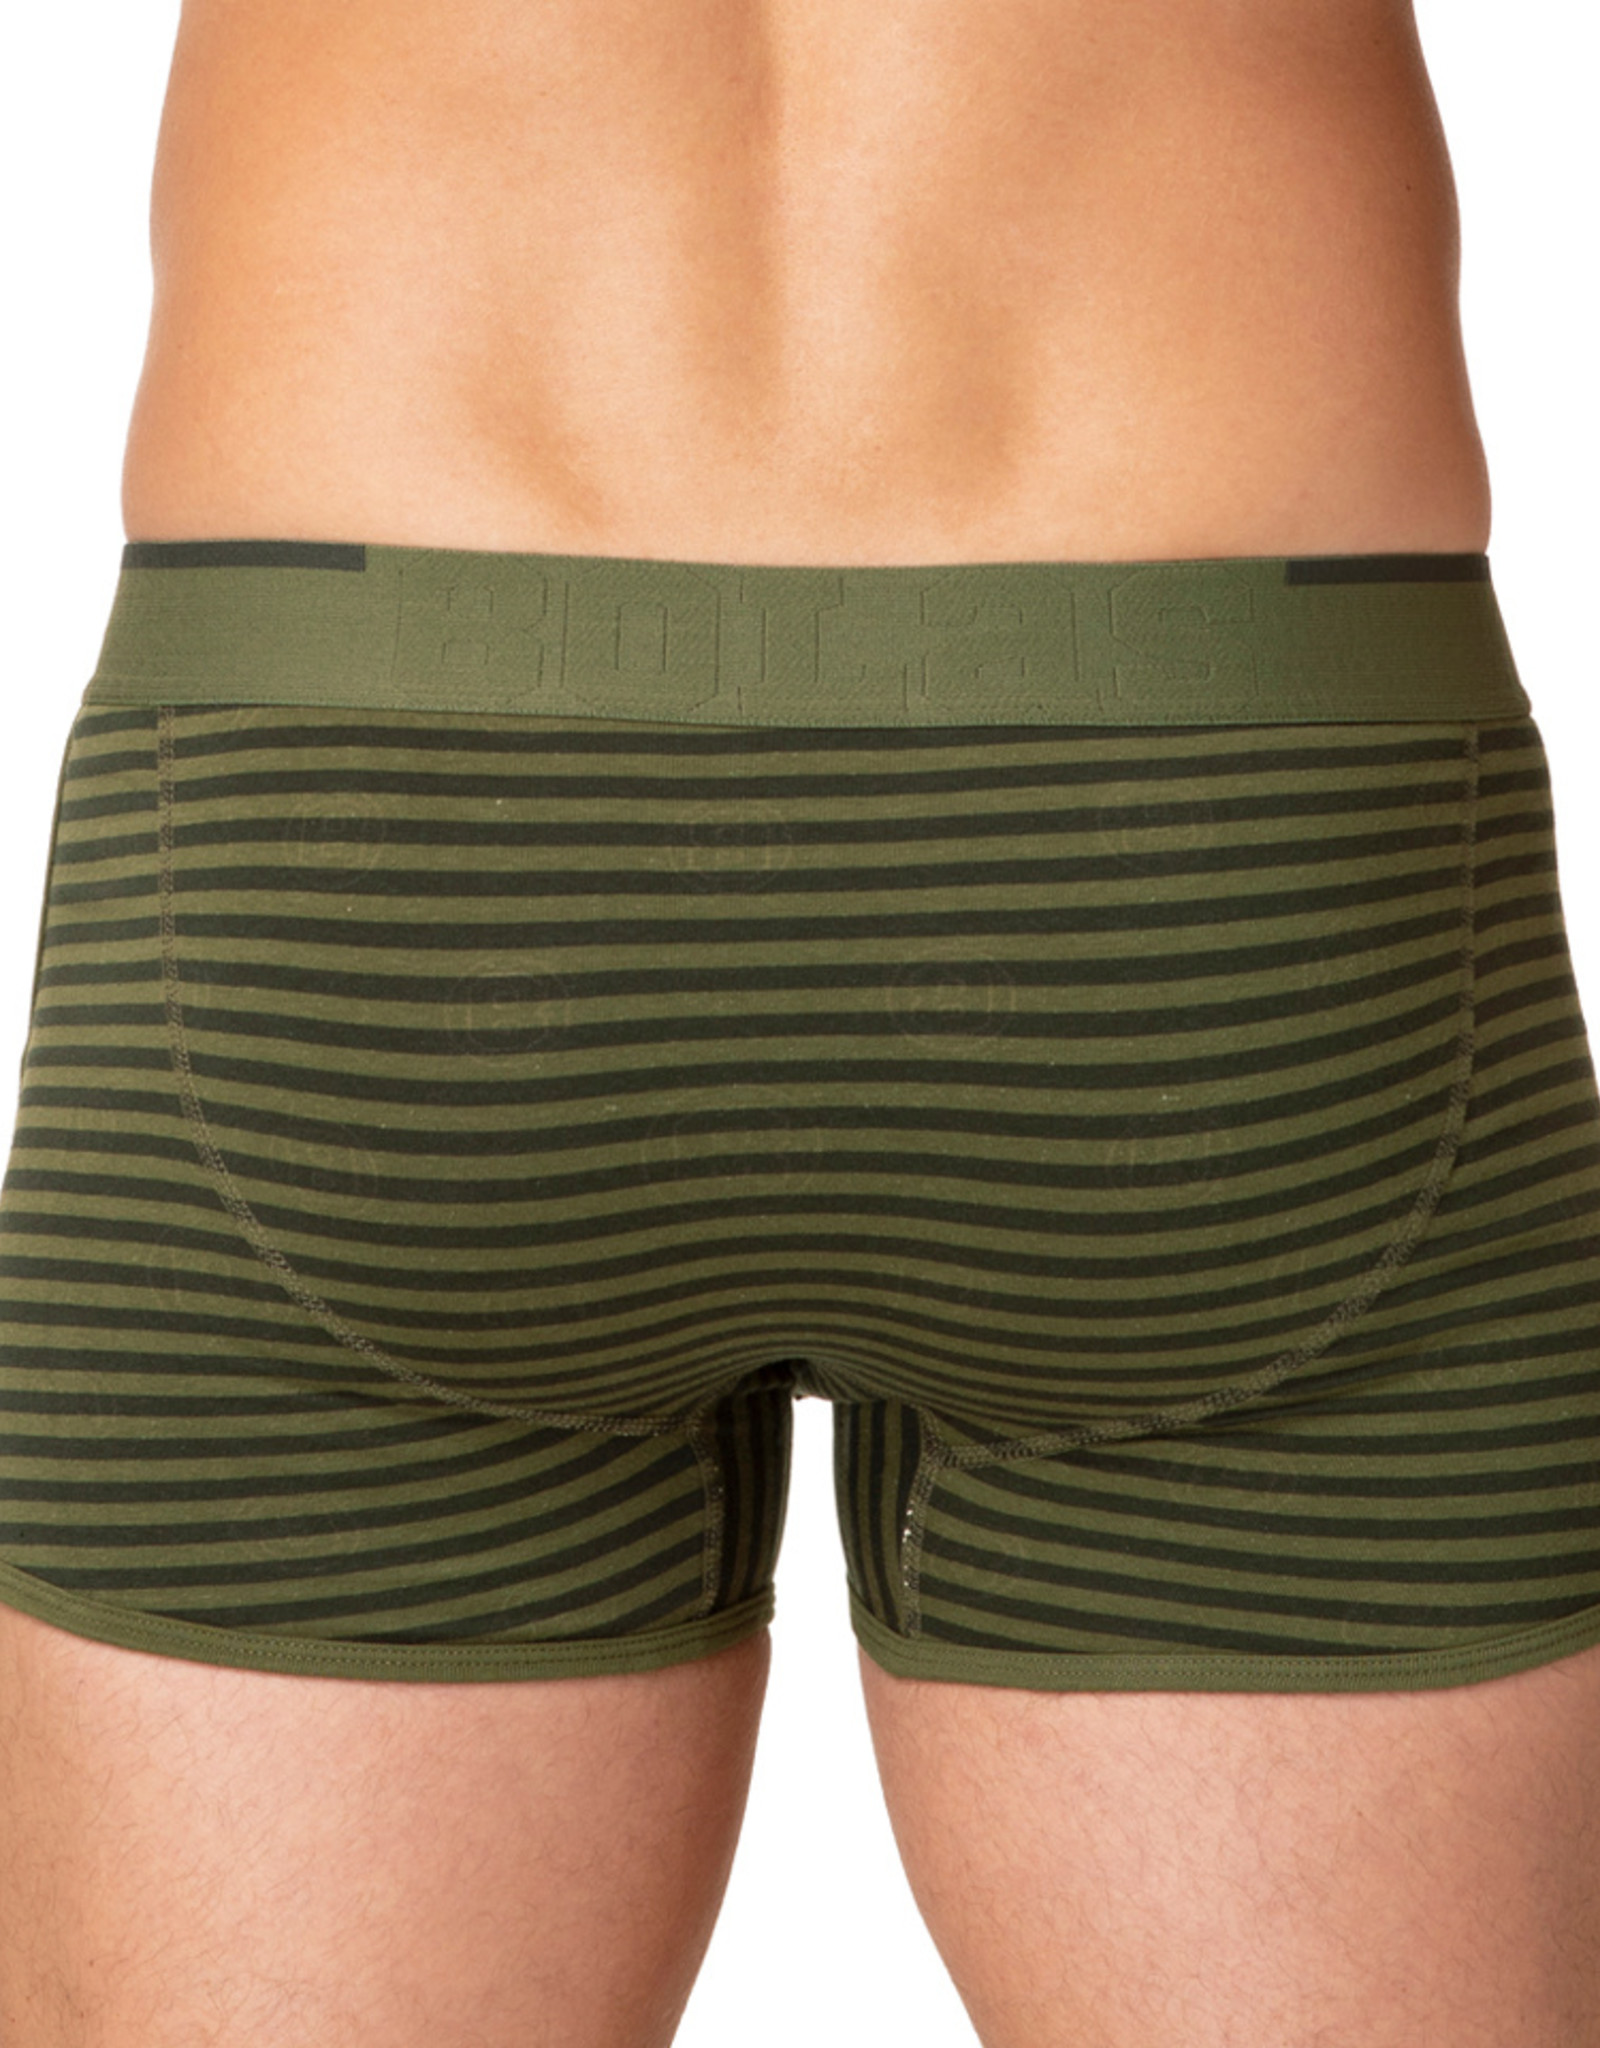 Bolas Underwear Bolas Green Stripes